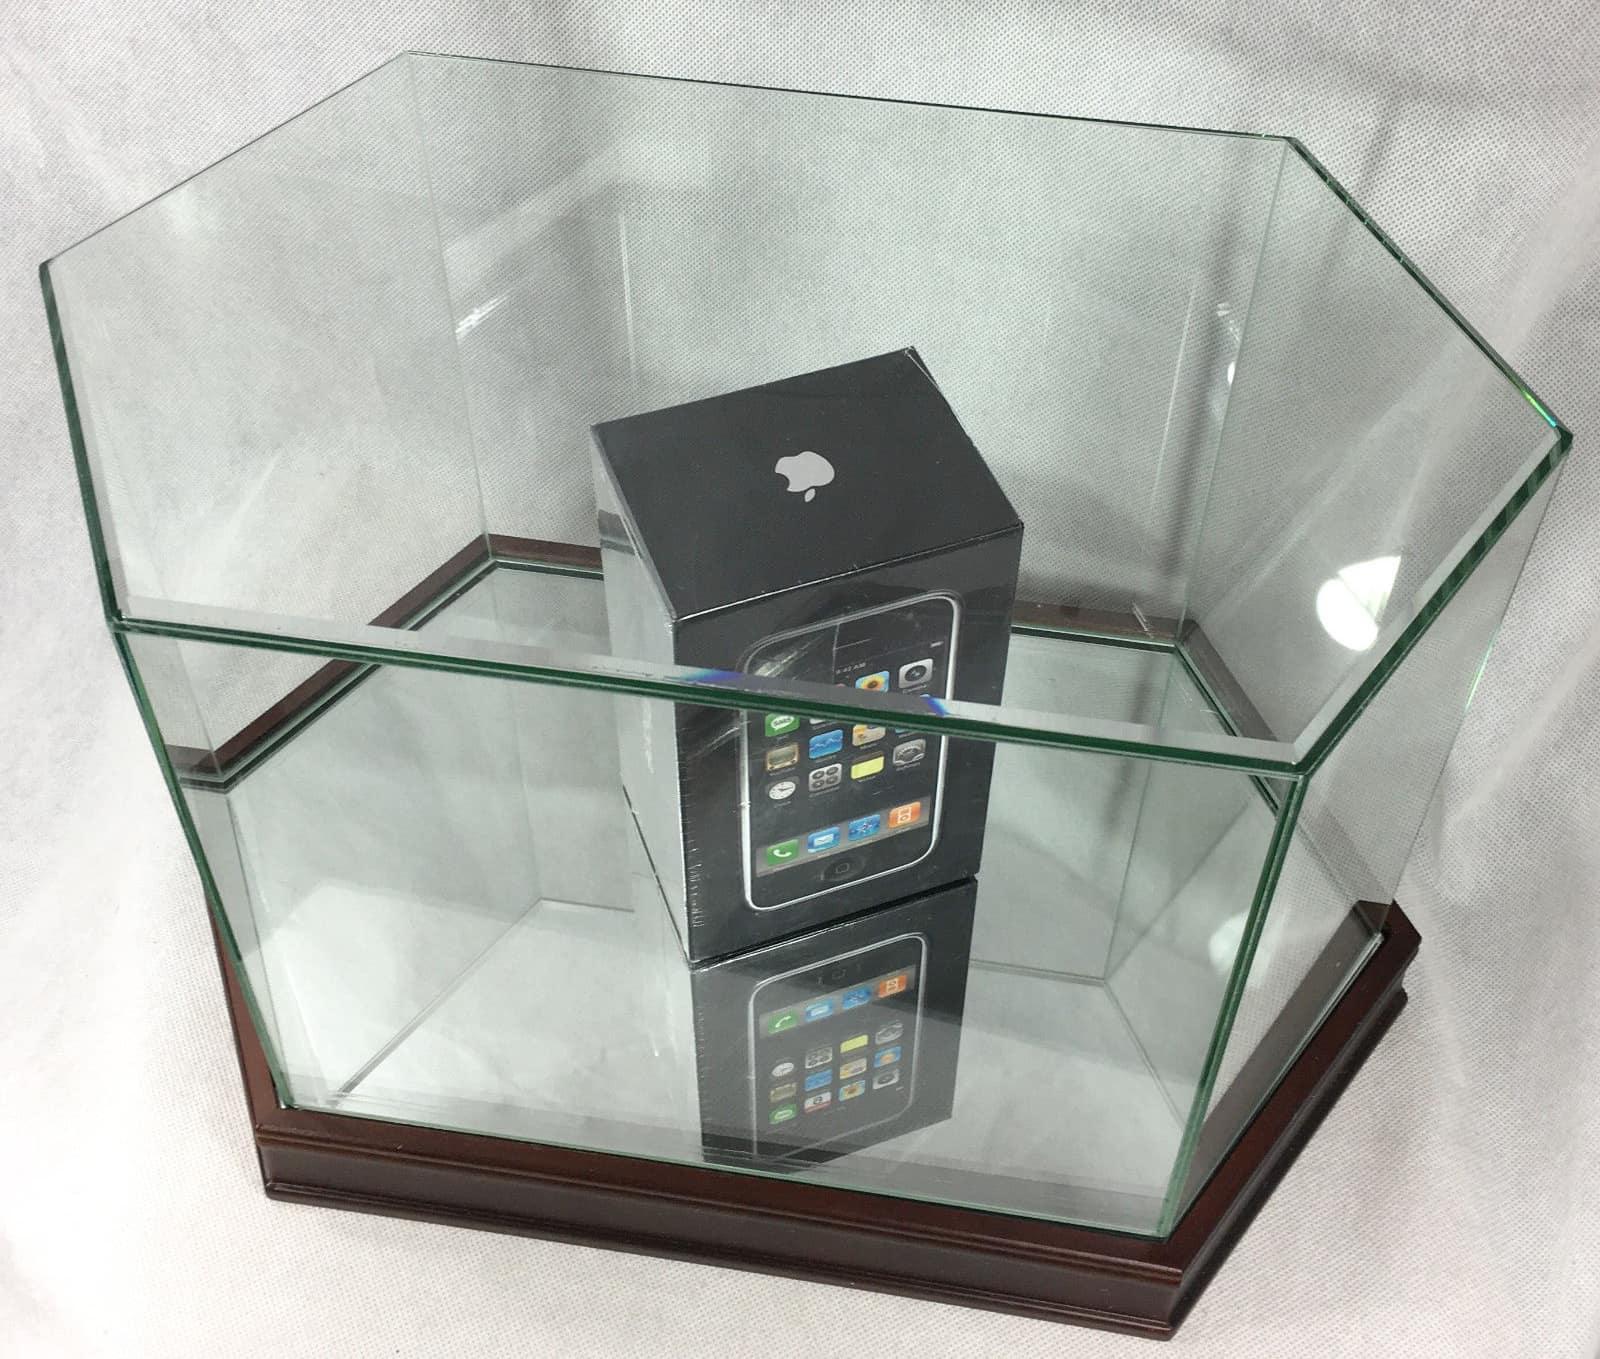 2G iPhone on eBay